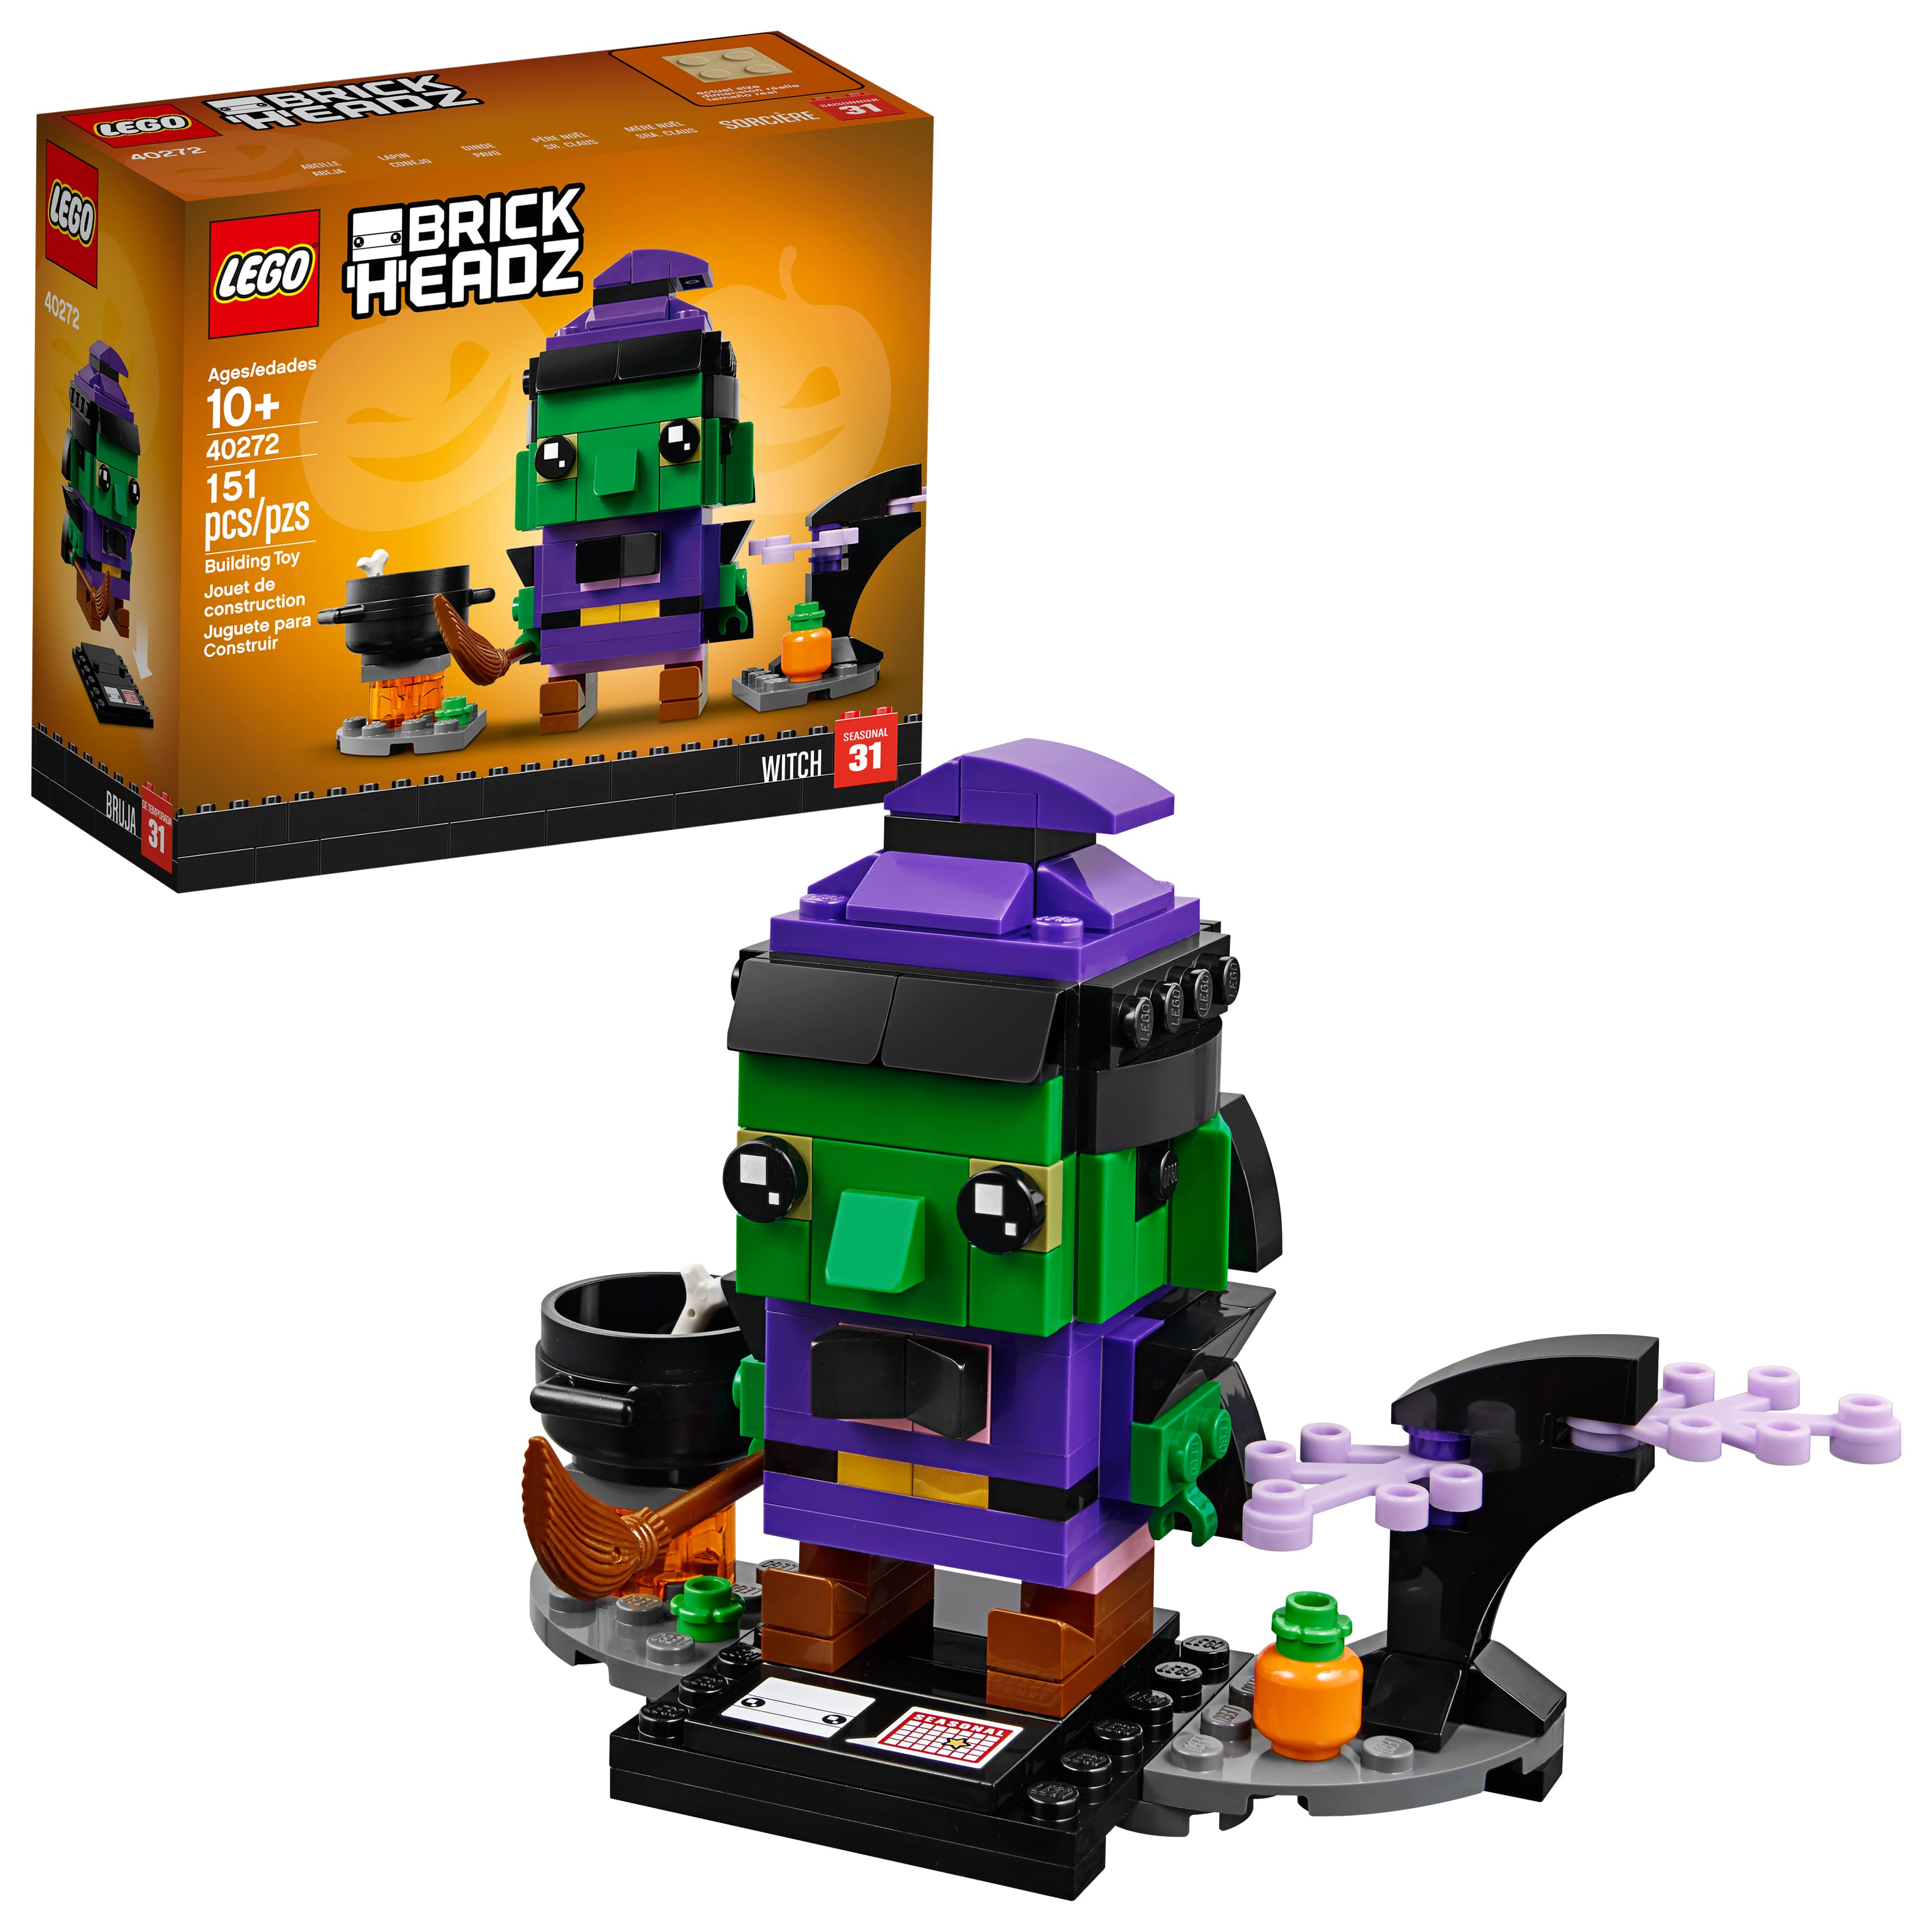 Lego BrickHeadz Halloween Witch 40272 ~ Walmart ~ $5.99 w/free store pick up. Amazon $5.99 also.